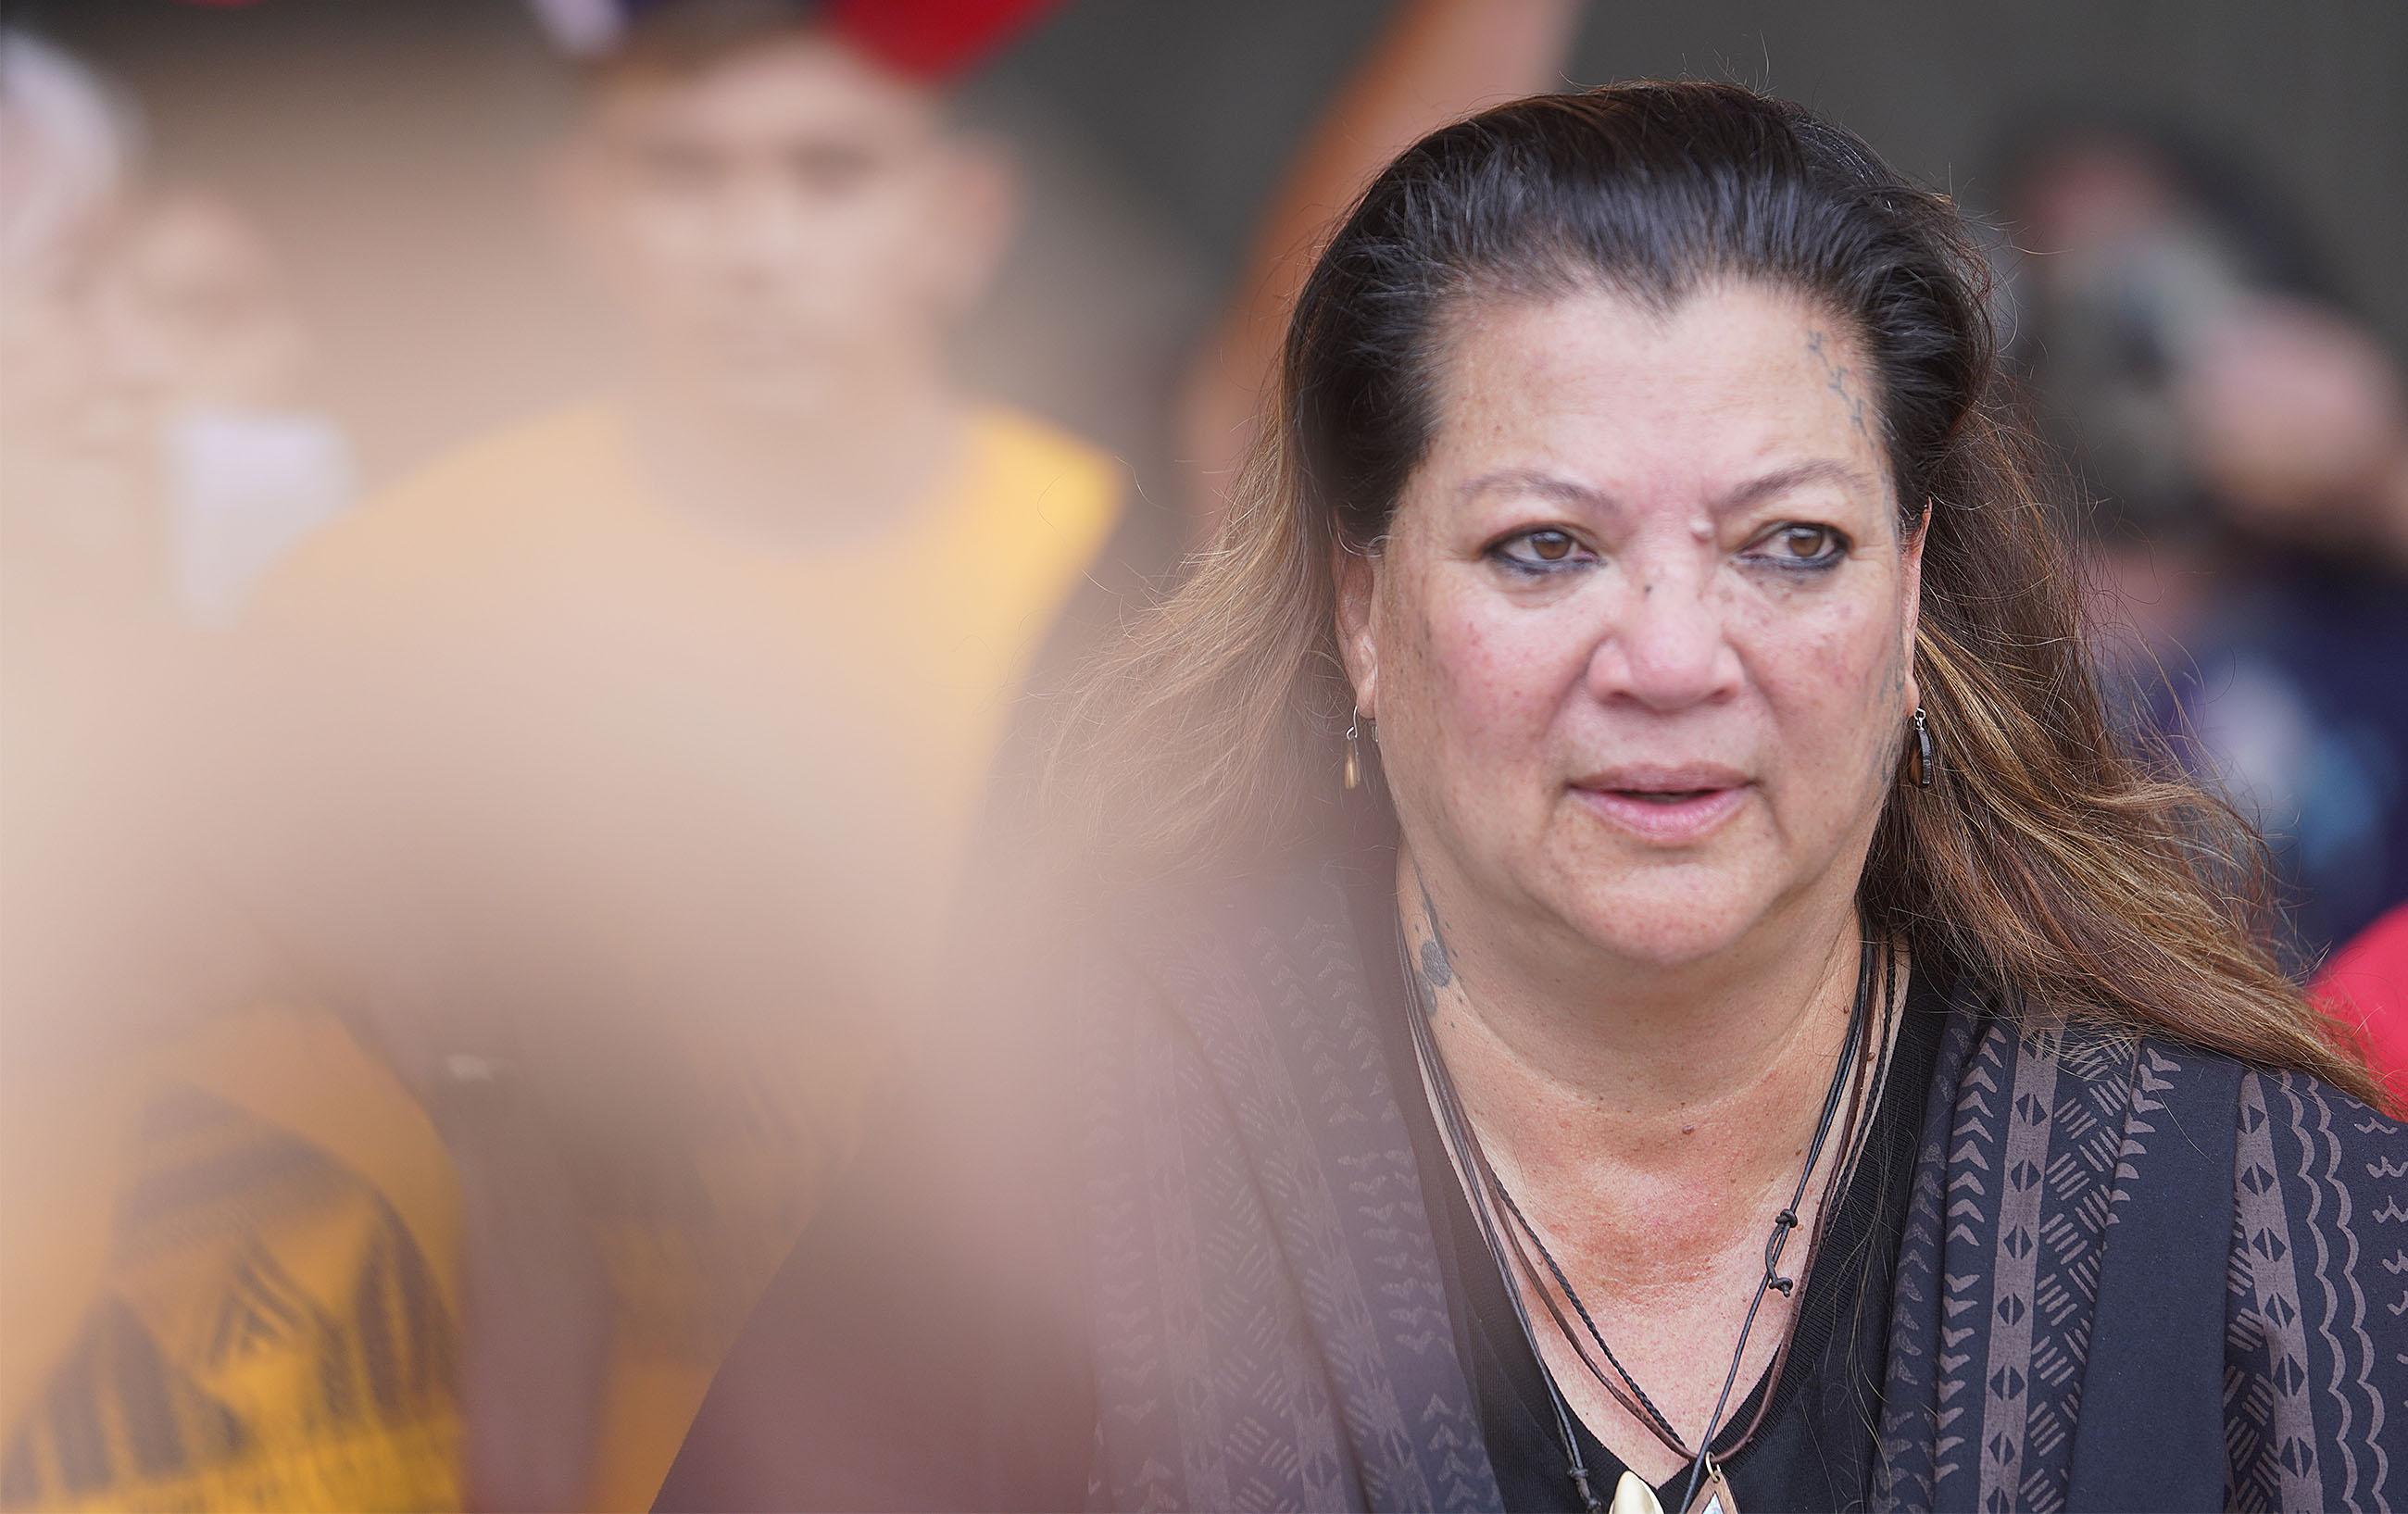 Kealoha Pisciotta speaks in opposition to TMT on Mauna Kea outside the Kalanimoku Building.